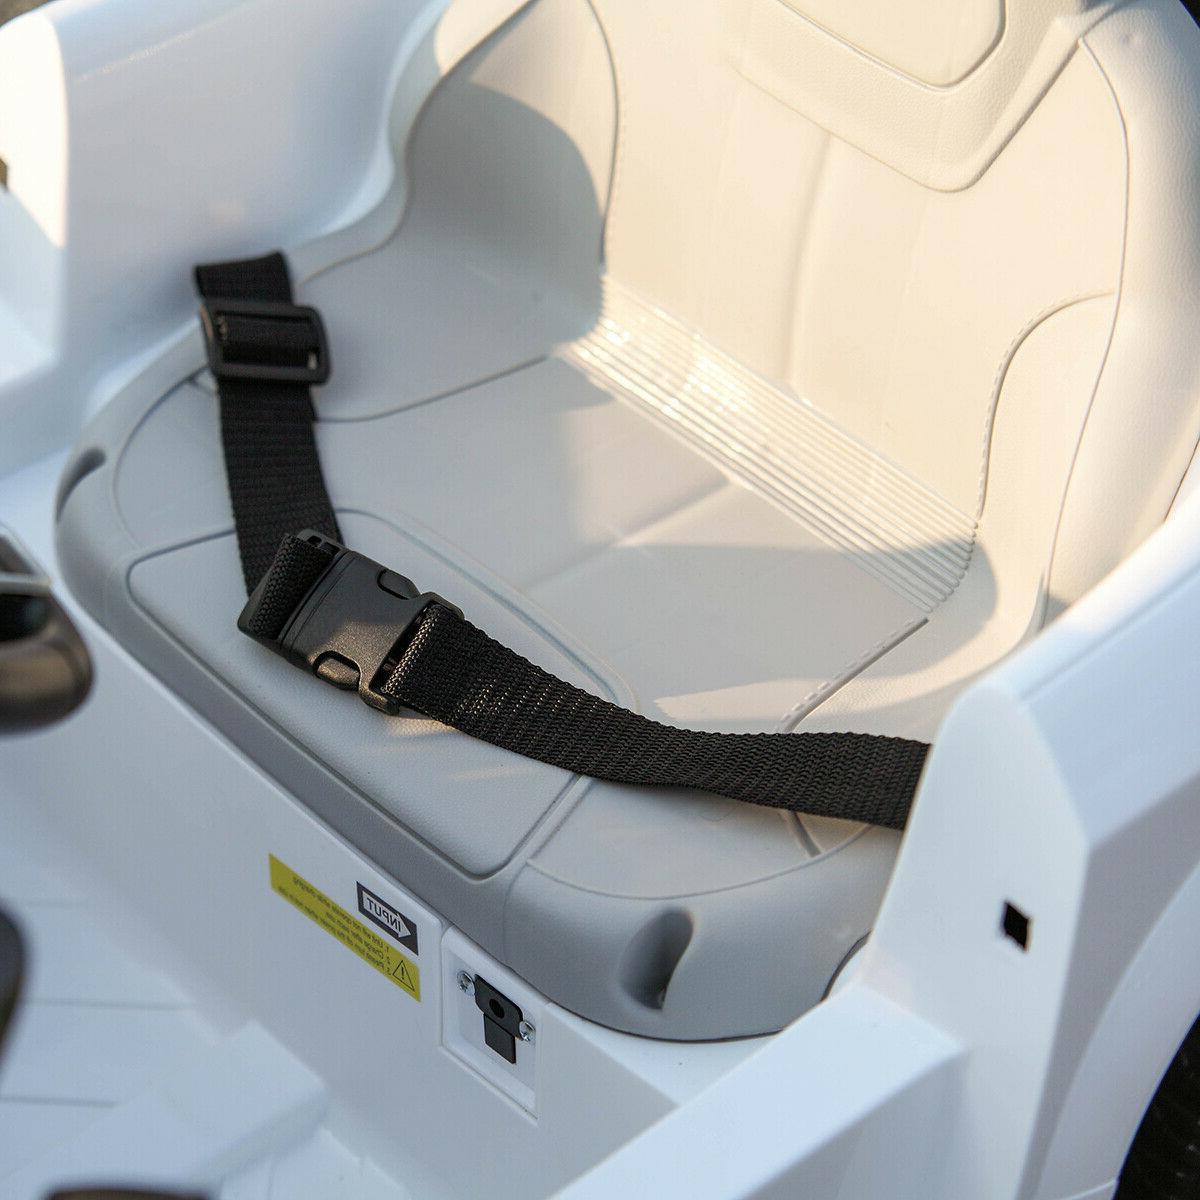 12V Kids Audi RS Toys Racing Motor Remote Control